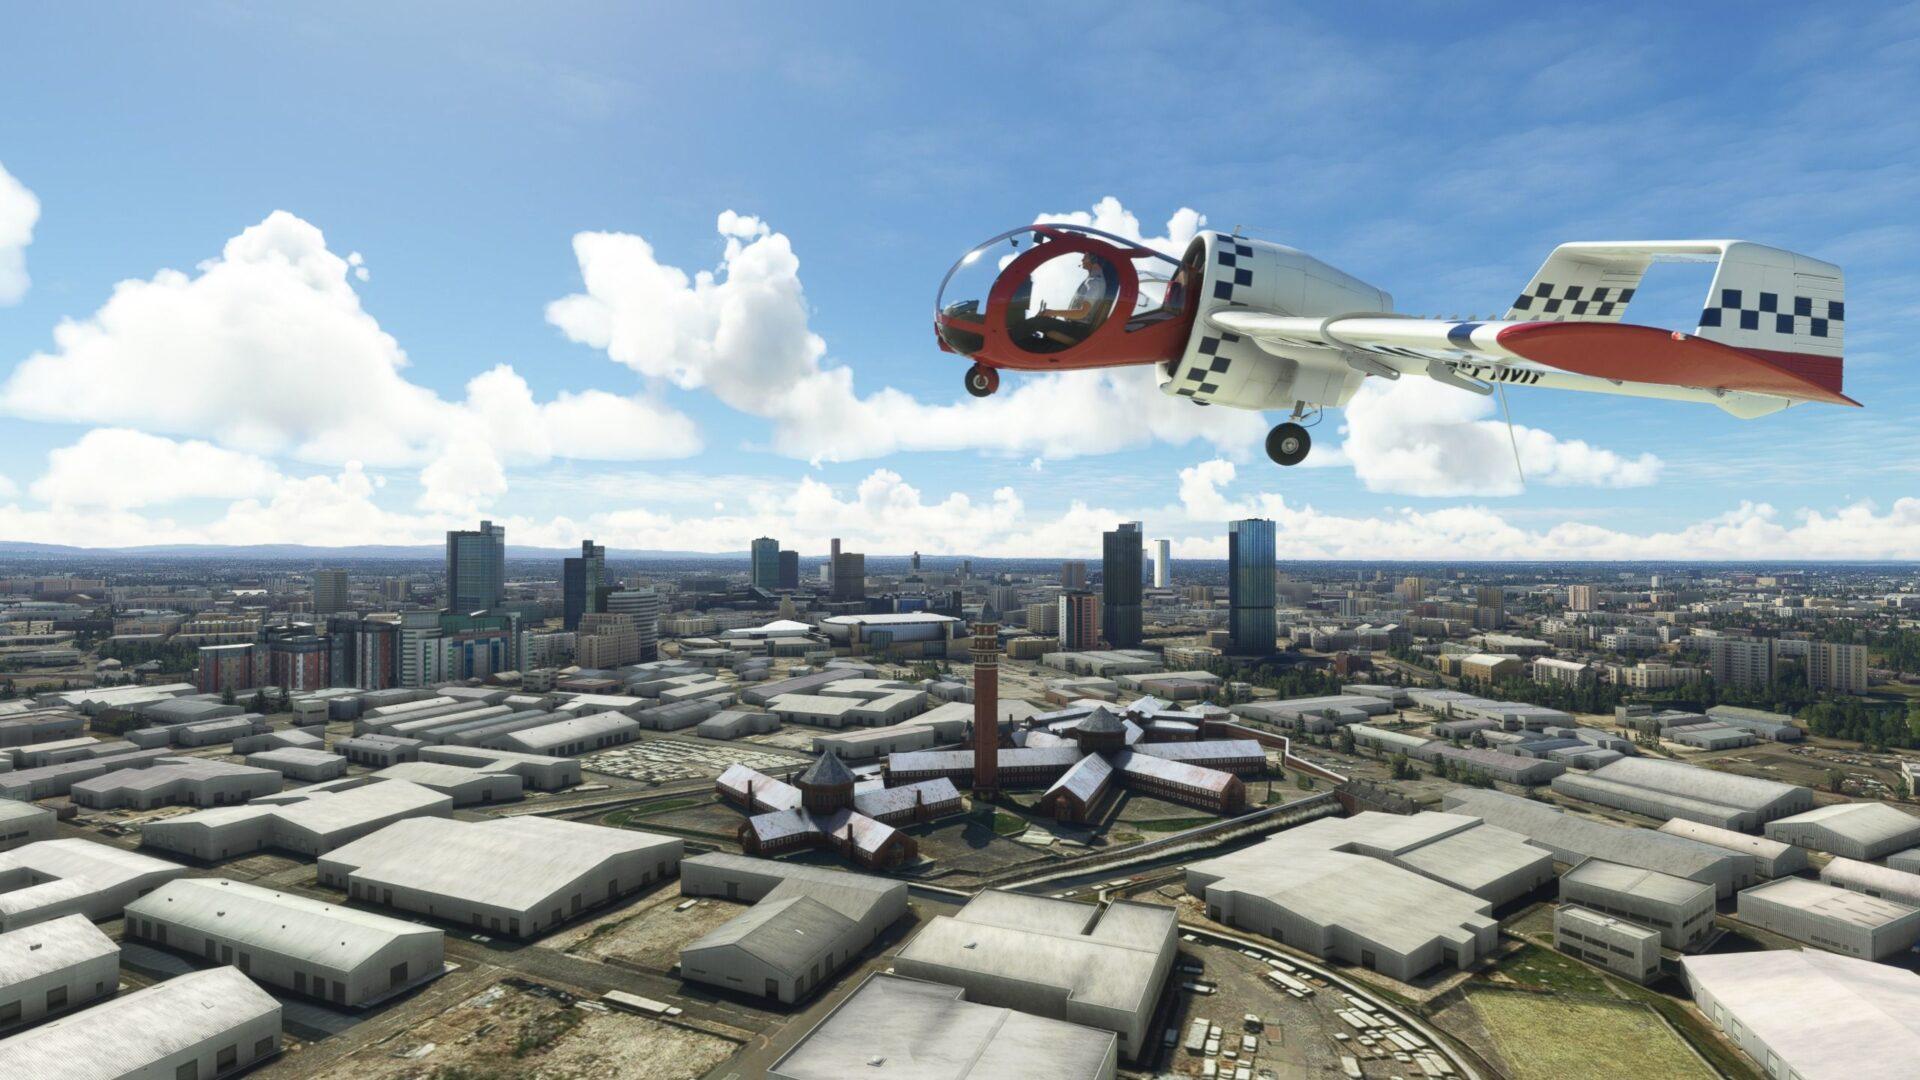 Great Britain Central for Microsoft Flight Simulator Critic Review